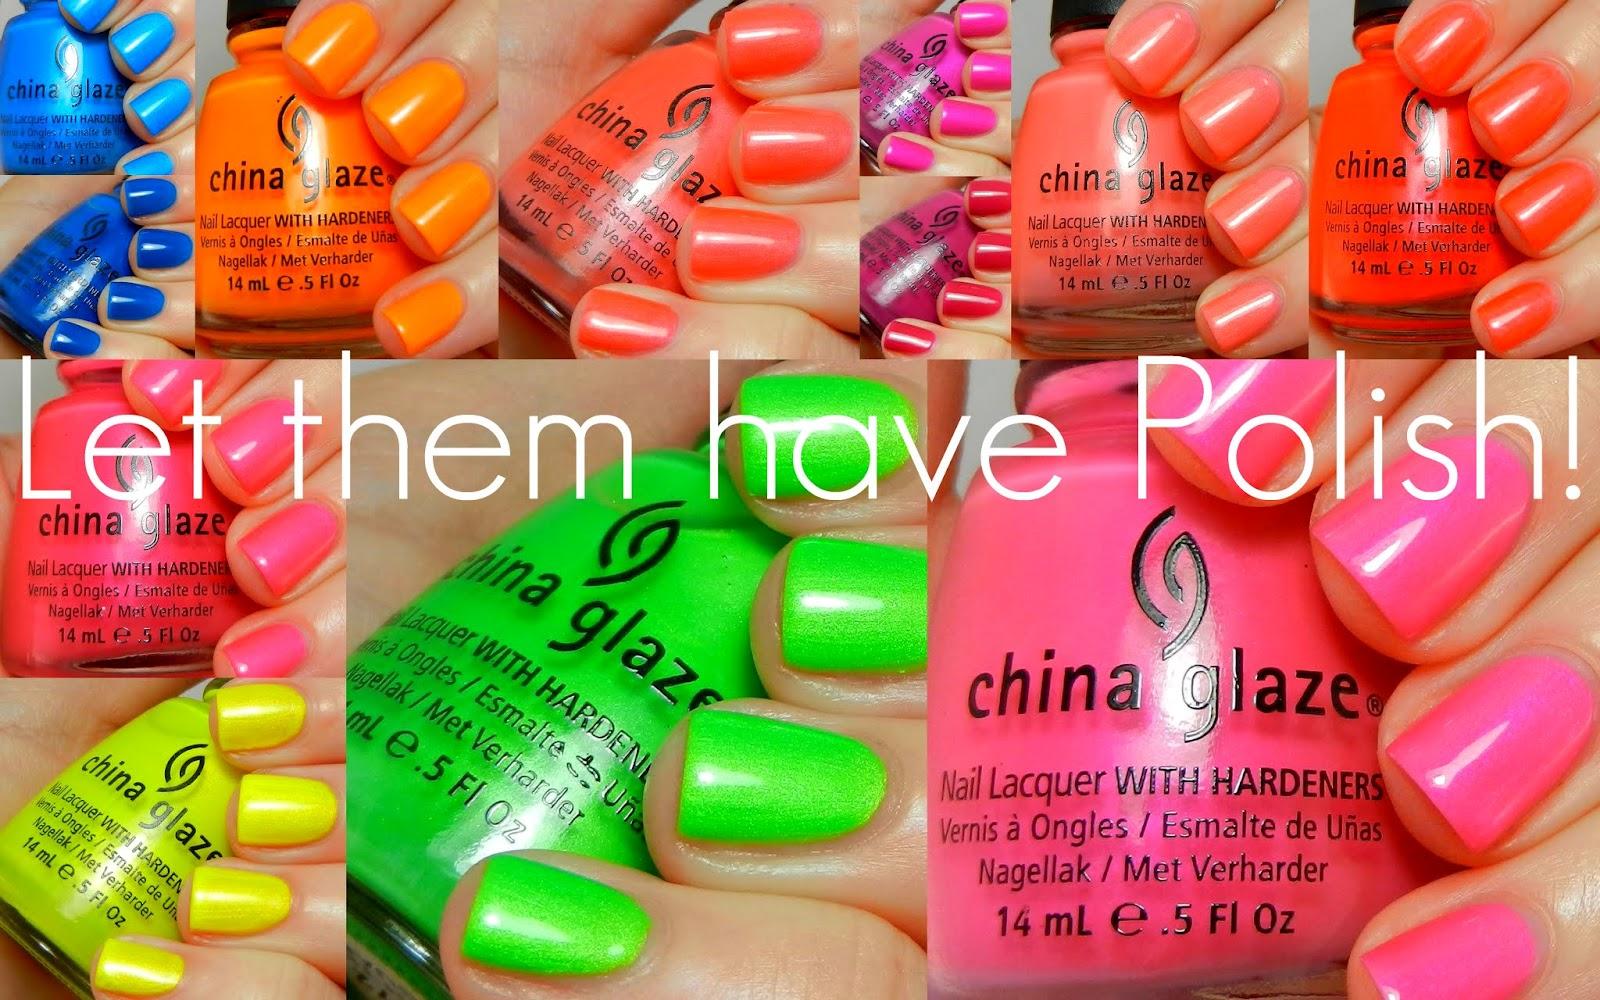 China Glaze Summer Neons 2012 Swactches